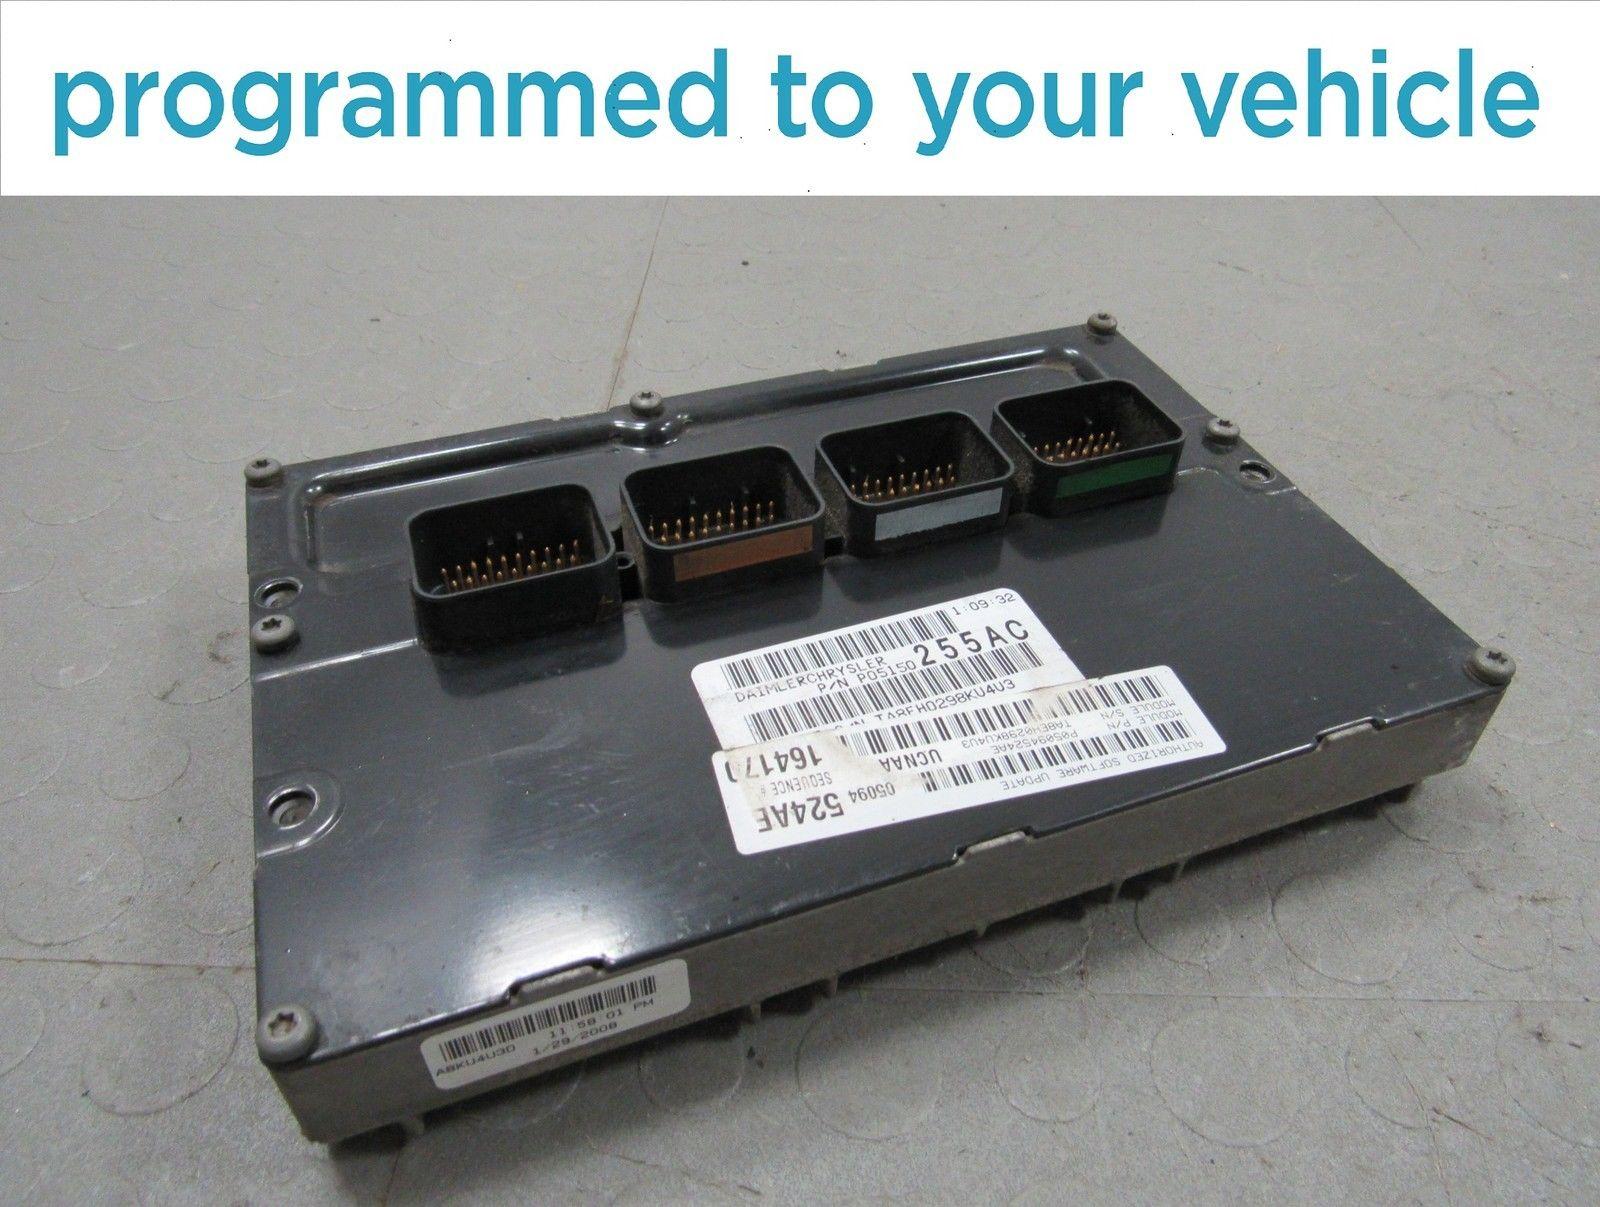 08 Dodge Ram 1500 4 7L Fed AT ECU ECM PCM Engine Computer 524 05094524AE  PROG A